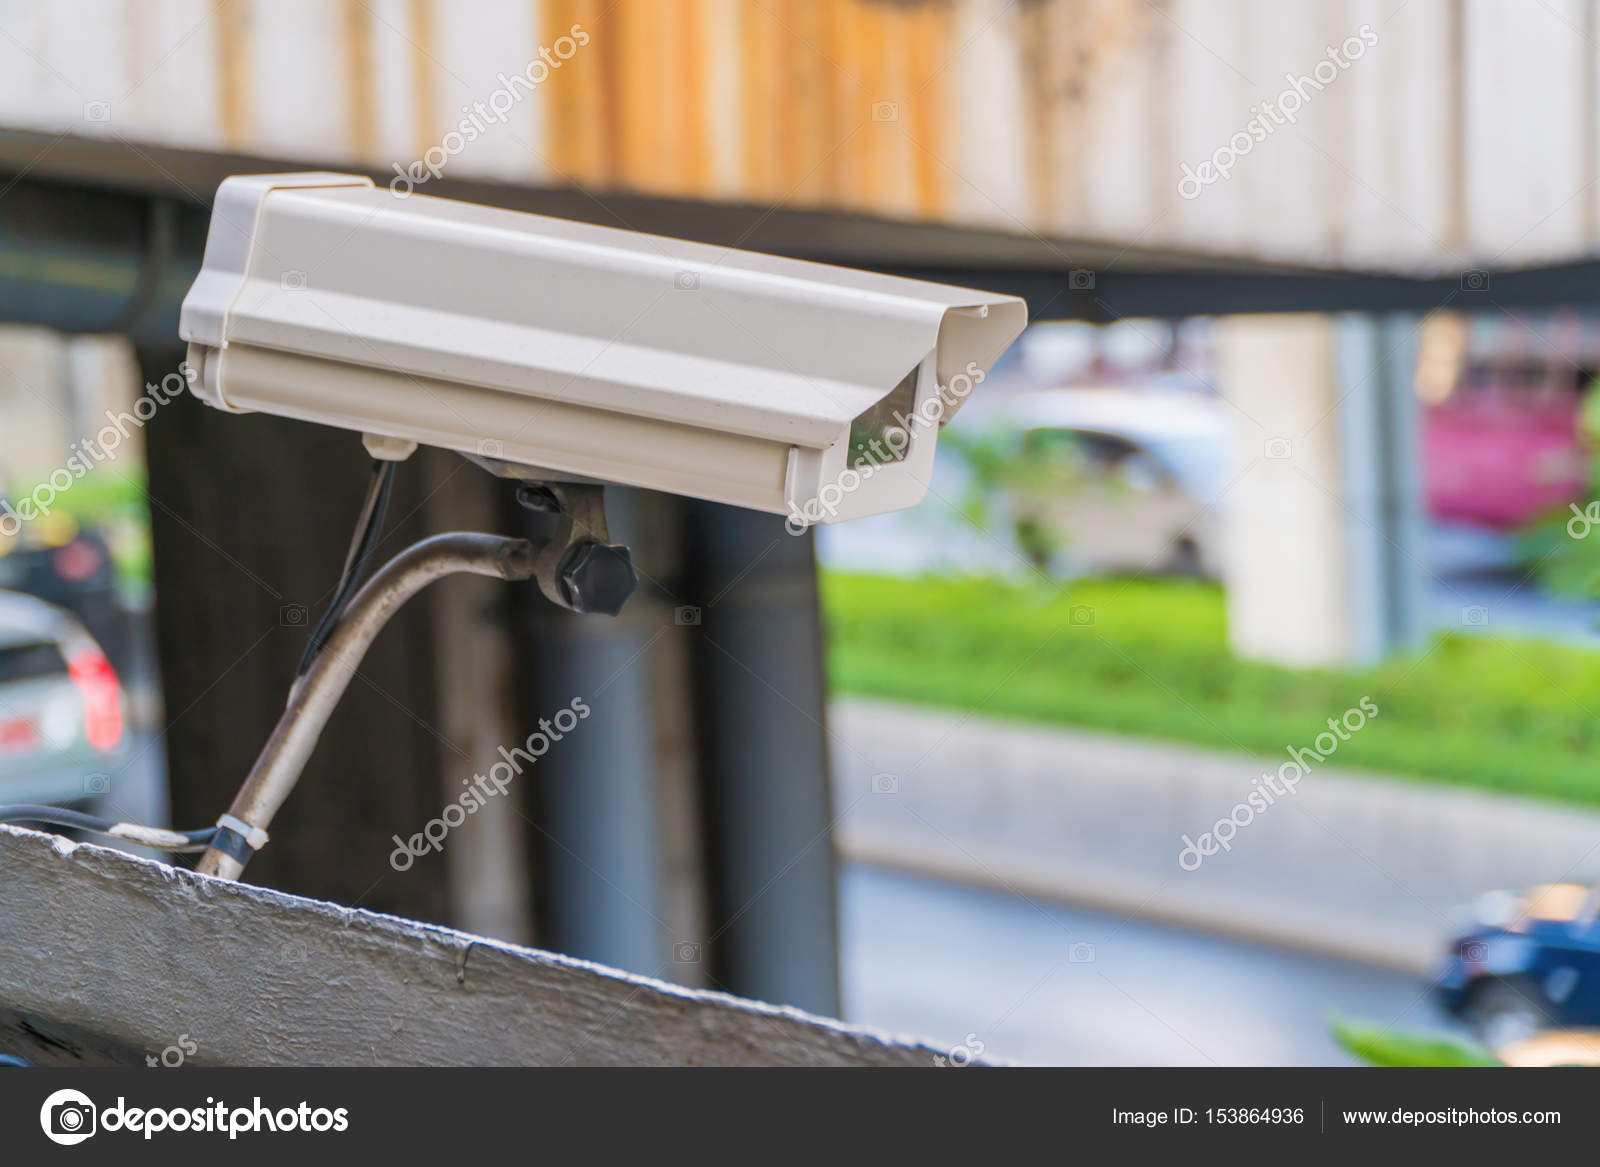 Circuito Fechado De Tv : C mera de segurança cctv circuito fechado de televisão no público